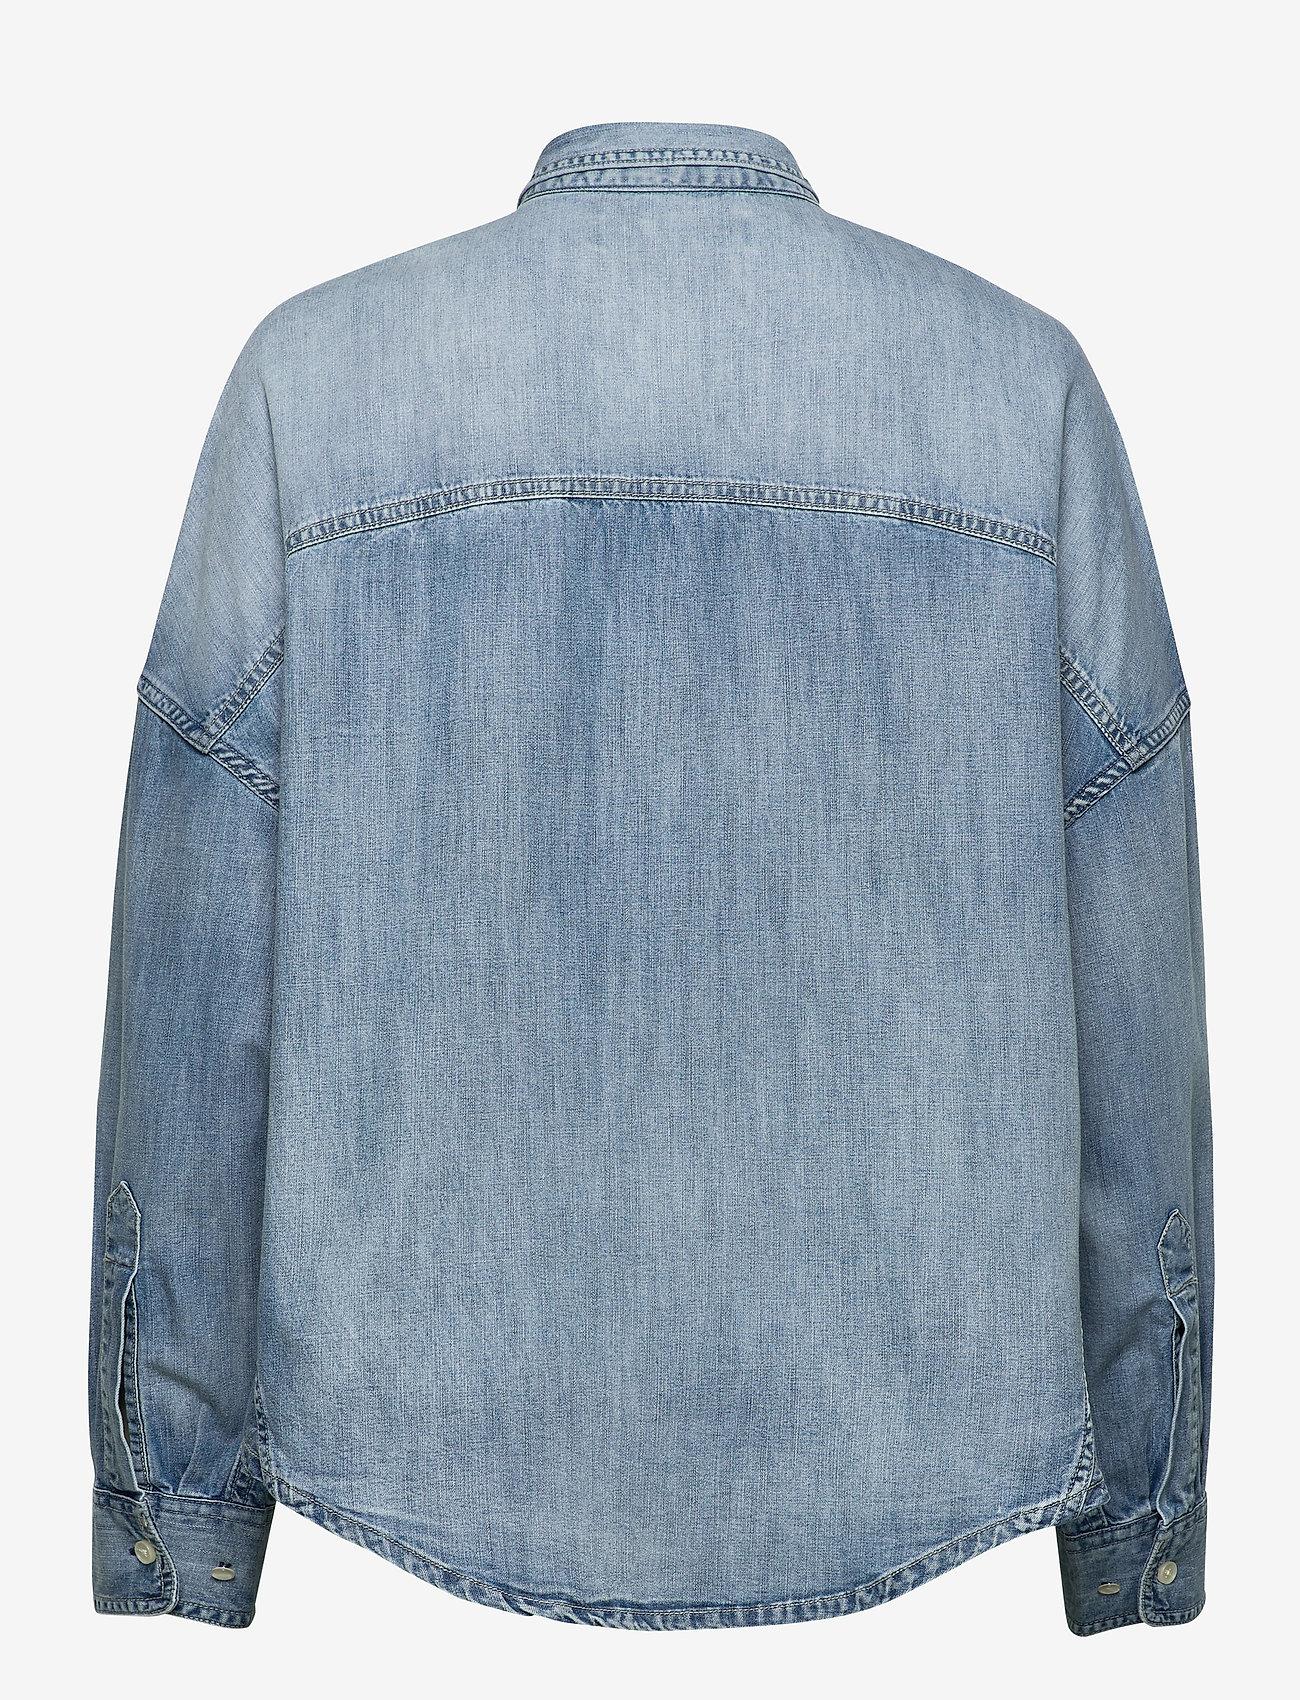 Replay - Shirt - jeansblouses - light blue - 1